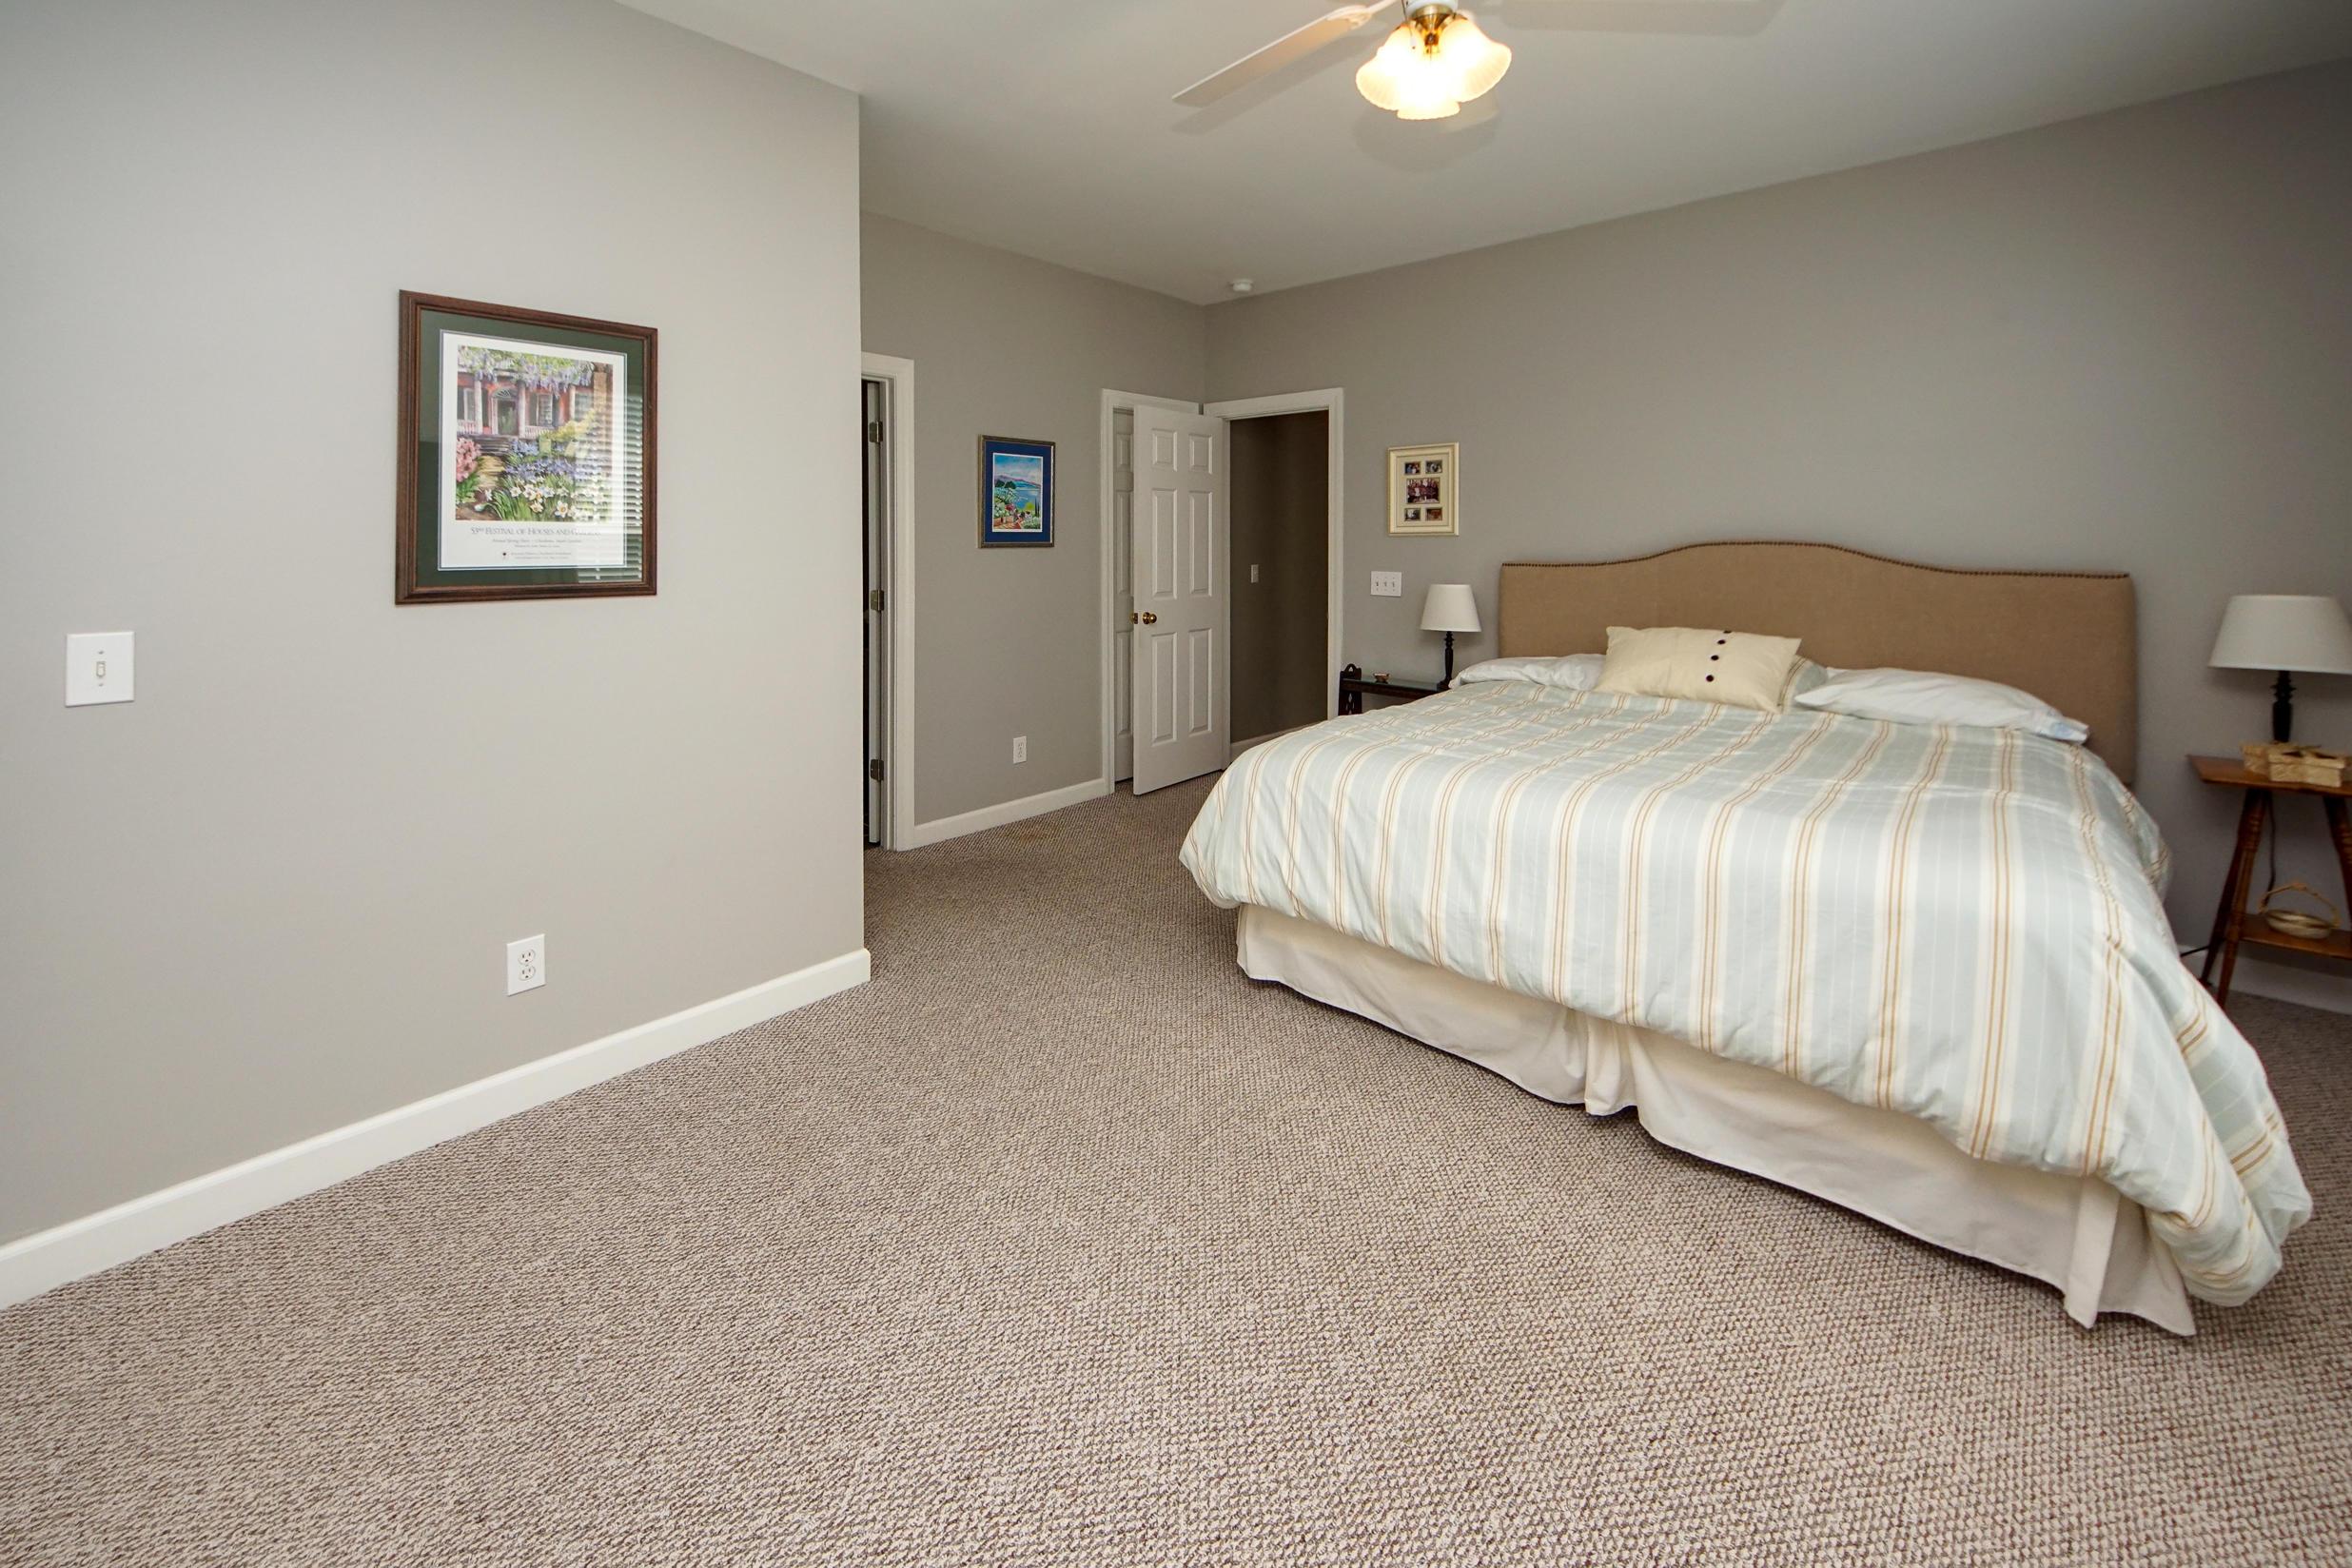 Dunes West Homes For Sale - 1631 Camfield, Mount Pleasant, SC - 24